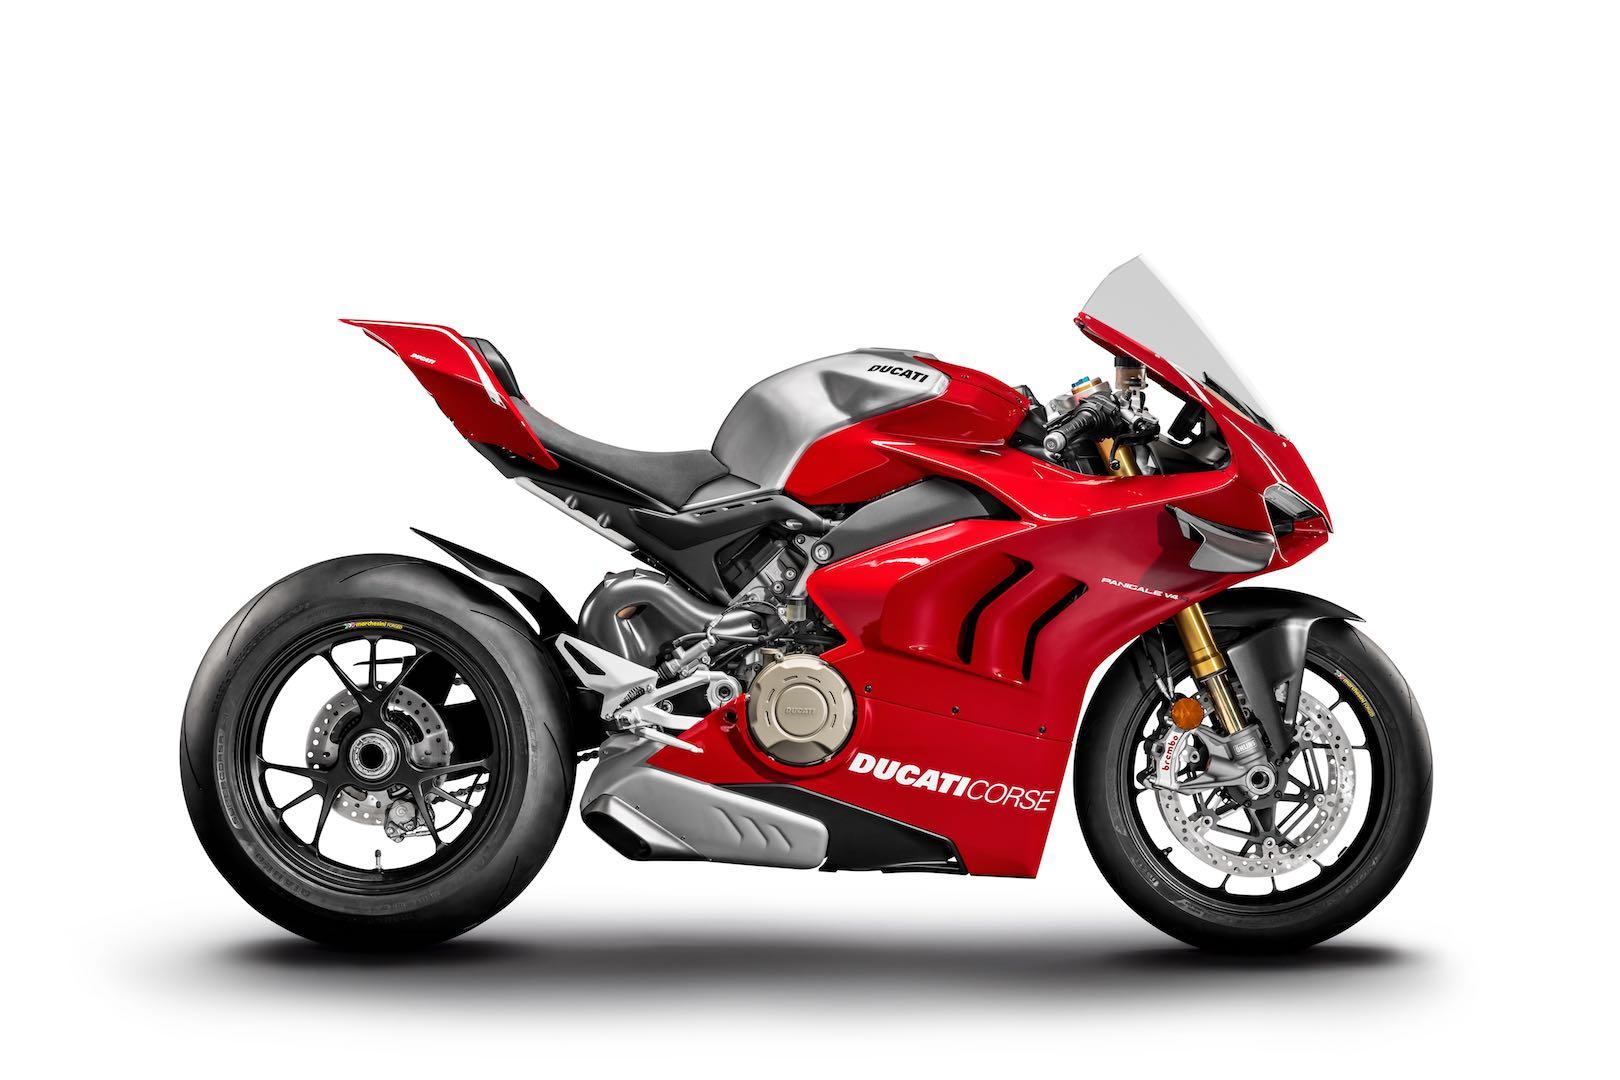 2019 Ducati Panigale V4 R colors